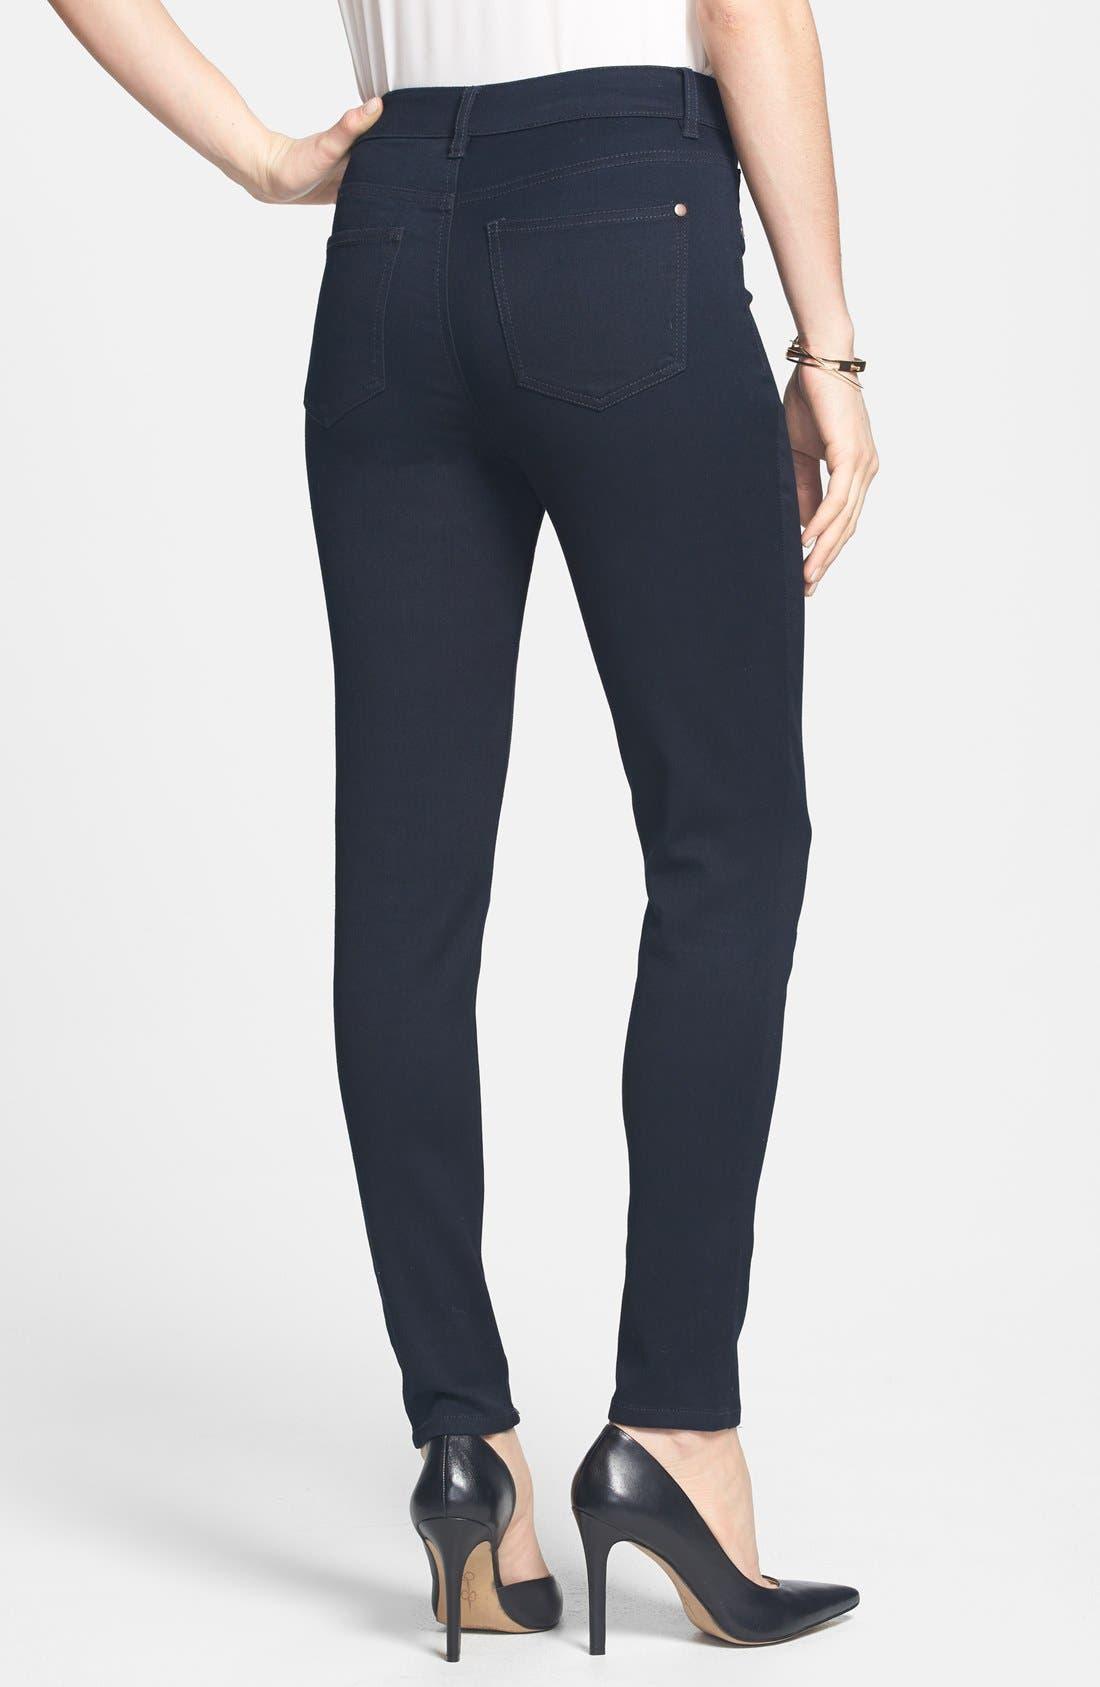 Alternate Image 2  - Fire 'The 10' High Waist Skinny Jeans (Dark Wash) (Juniors) (Online Only)